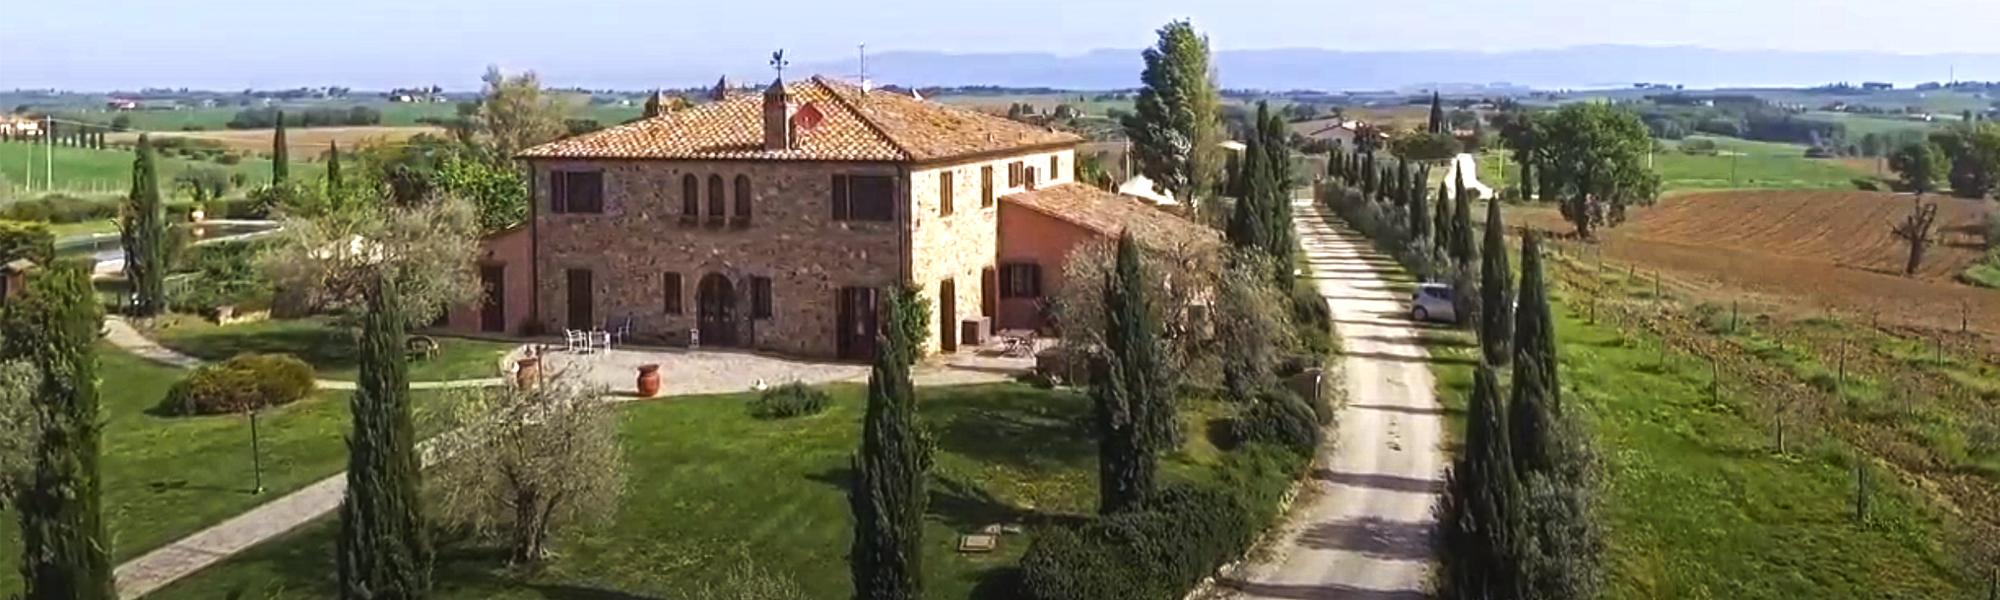 Azienda Agricola I Romiti